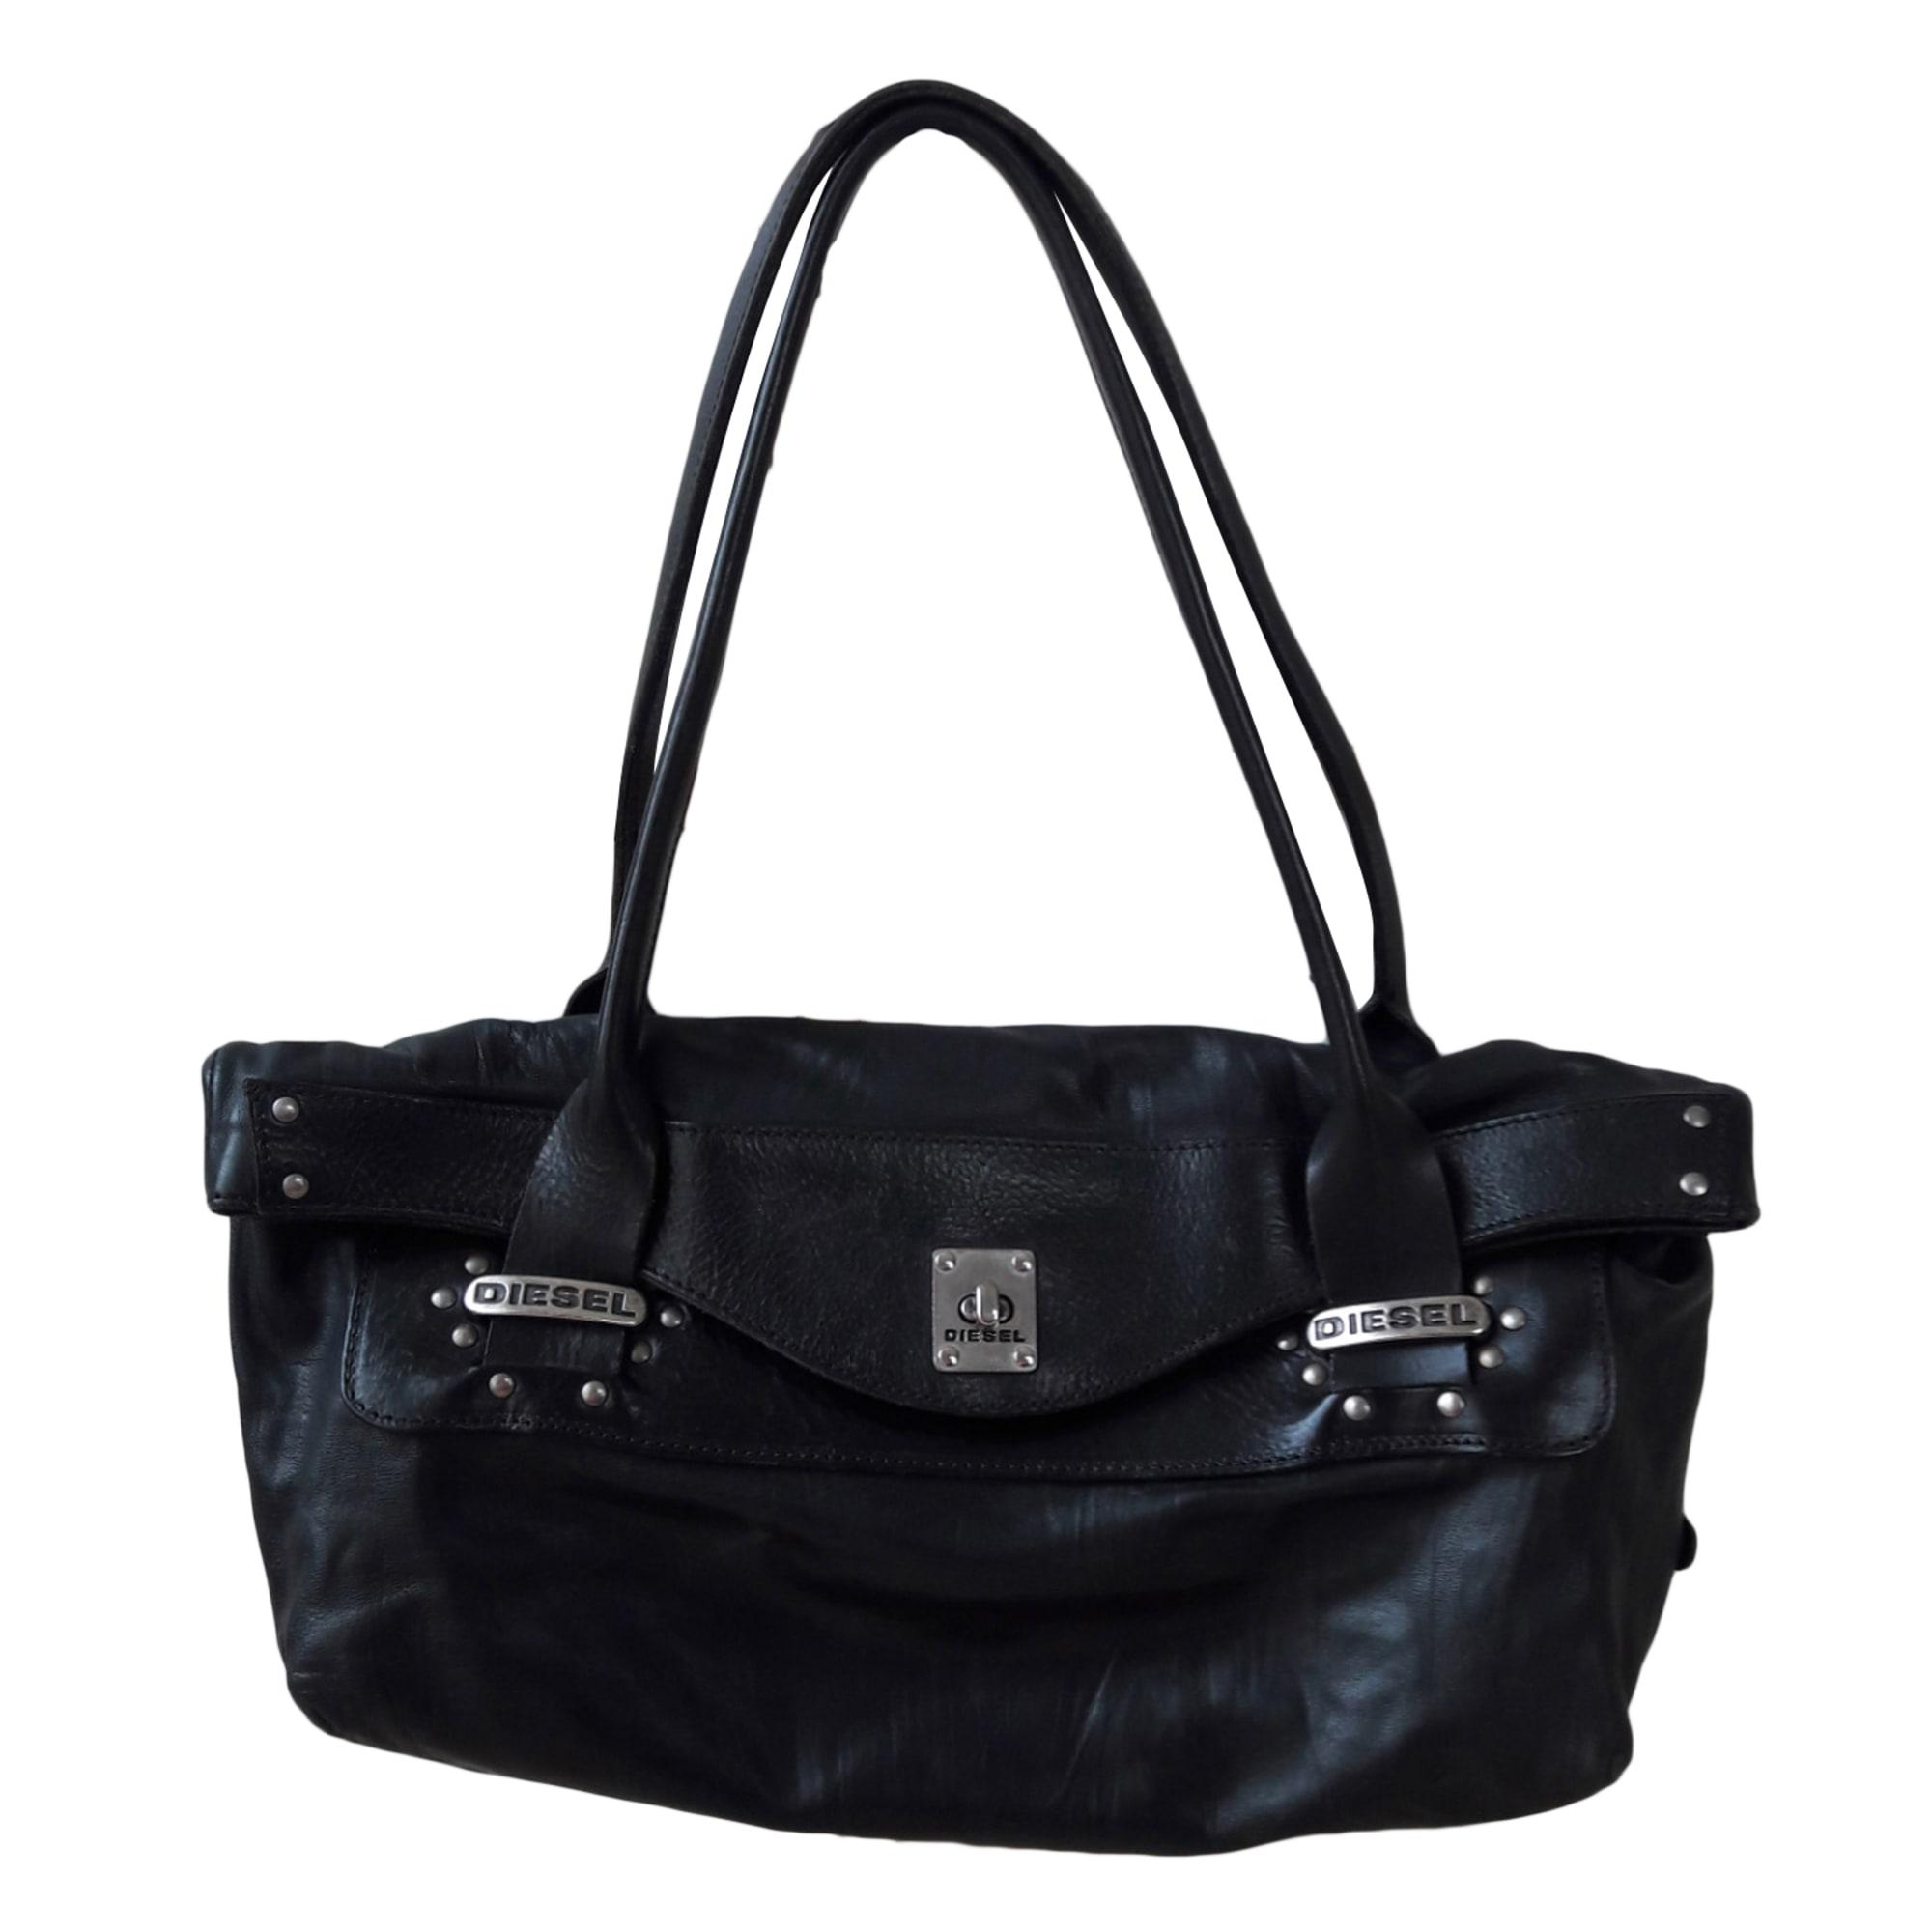 sac main en cuir diesel noir vendu par happy bear 7009414. Black Bedroom Furniture Sets. Home Design Ideas